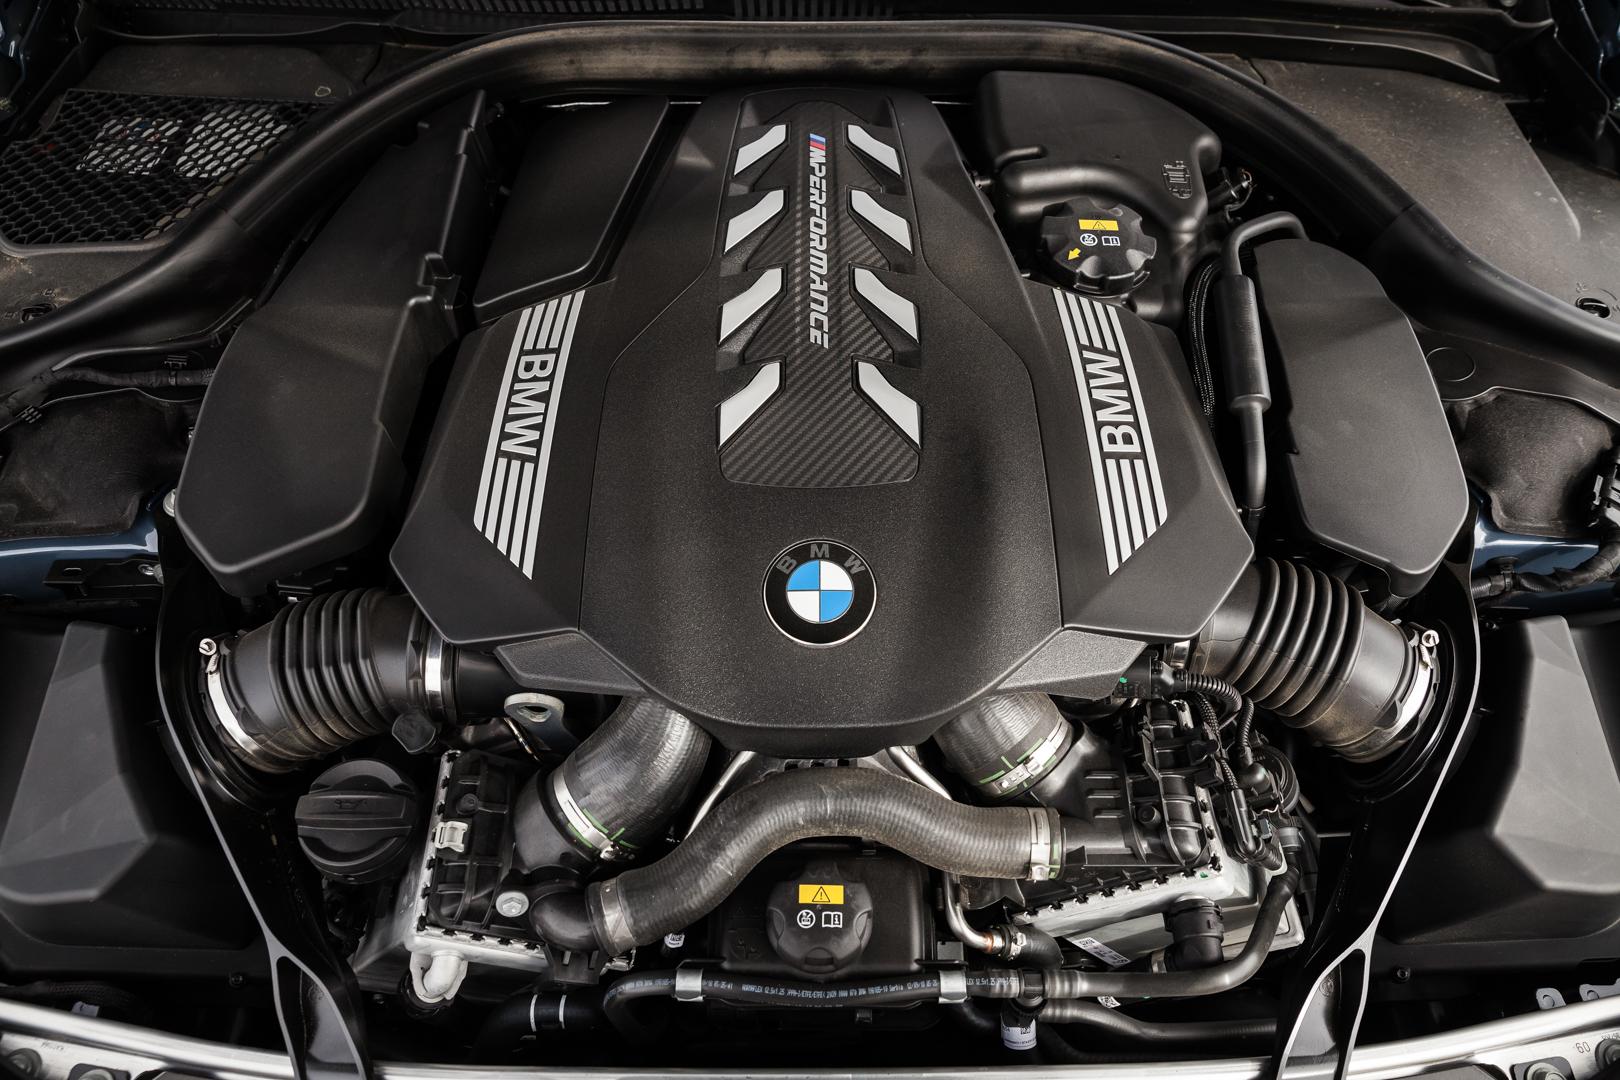 BMW M850i xDrive Thermal Club 58 of 49